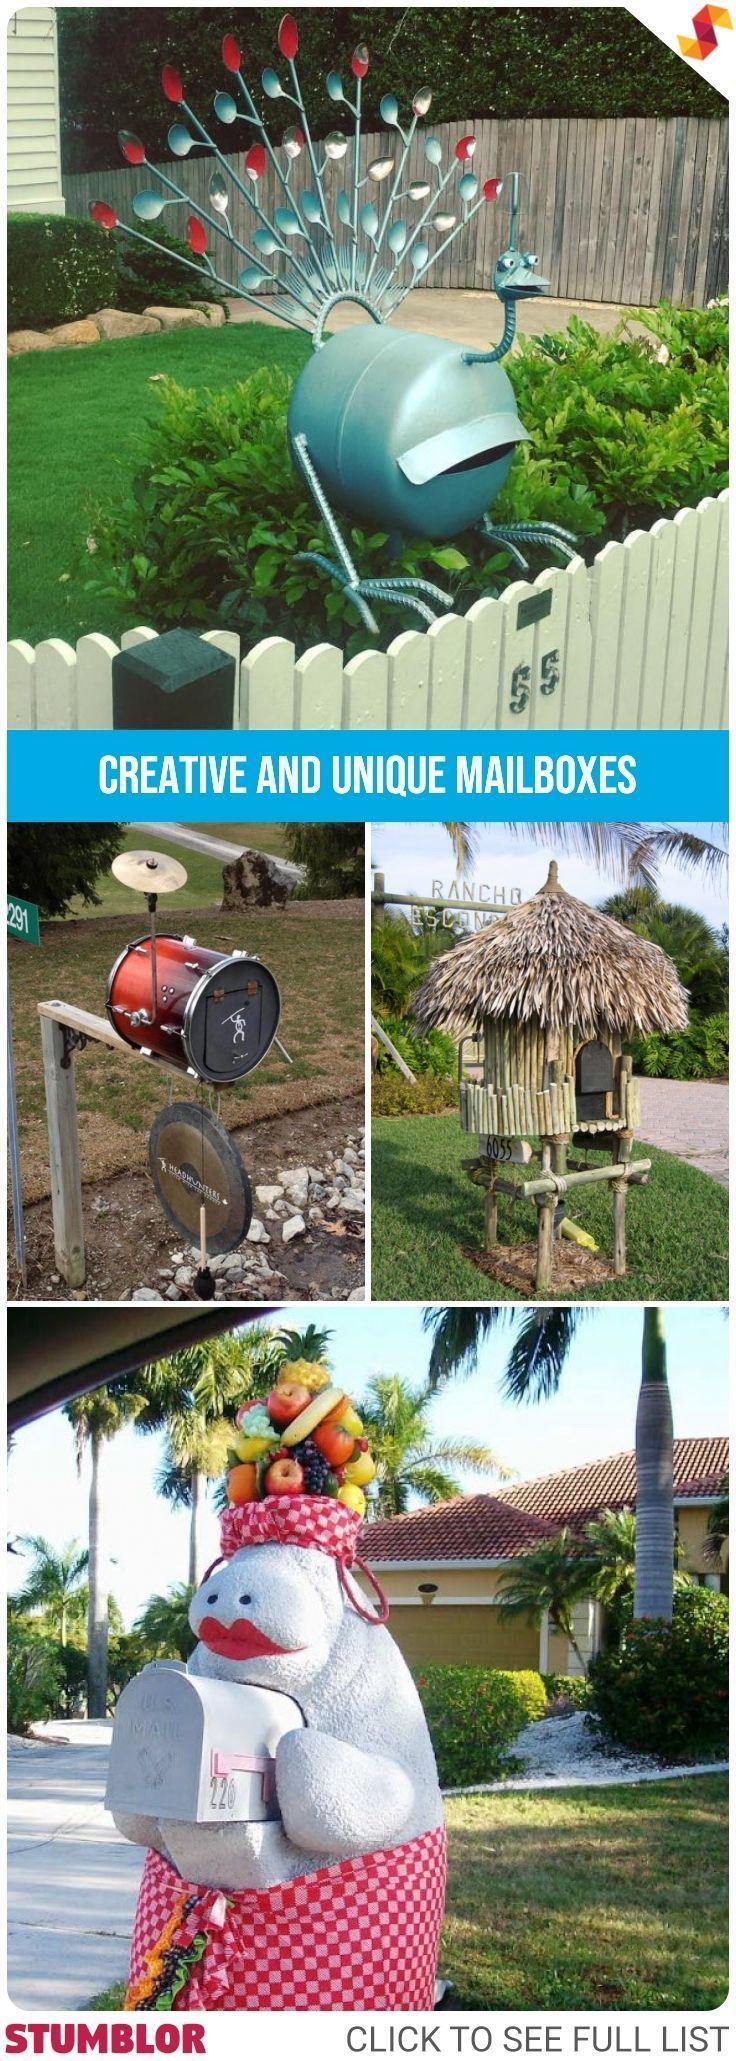 15 Creative And Unique Mailboxes Mail Mailbox Mailboxes Uniqe